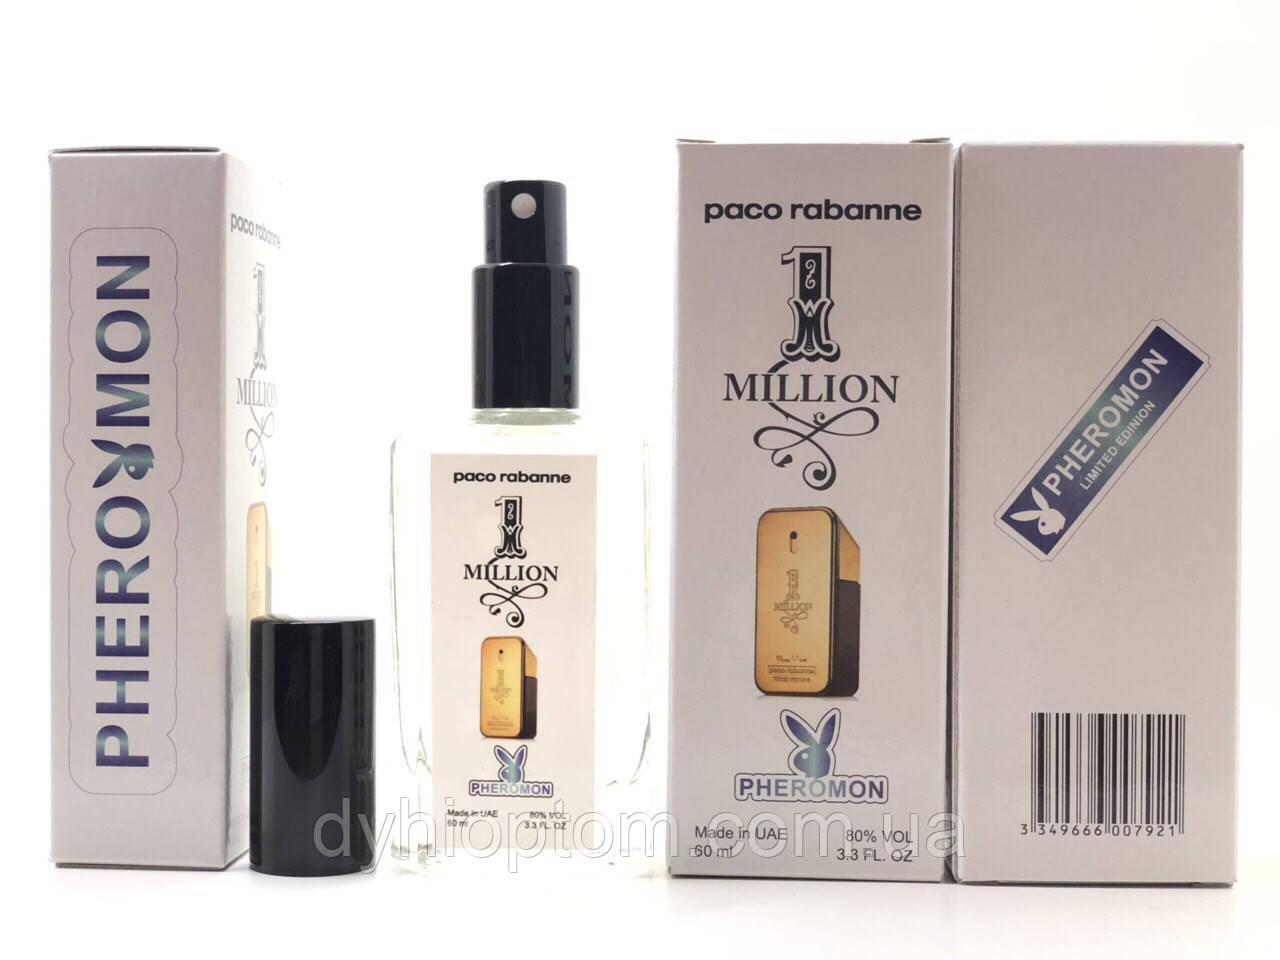 Мужской парфюм Paco Rabanne 1 Million 60 ml